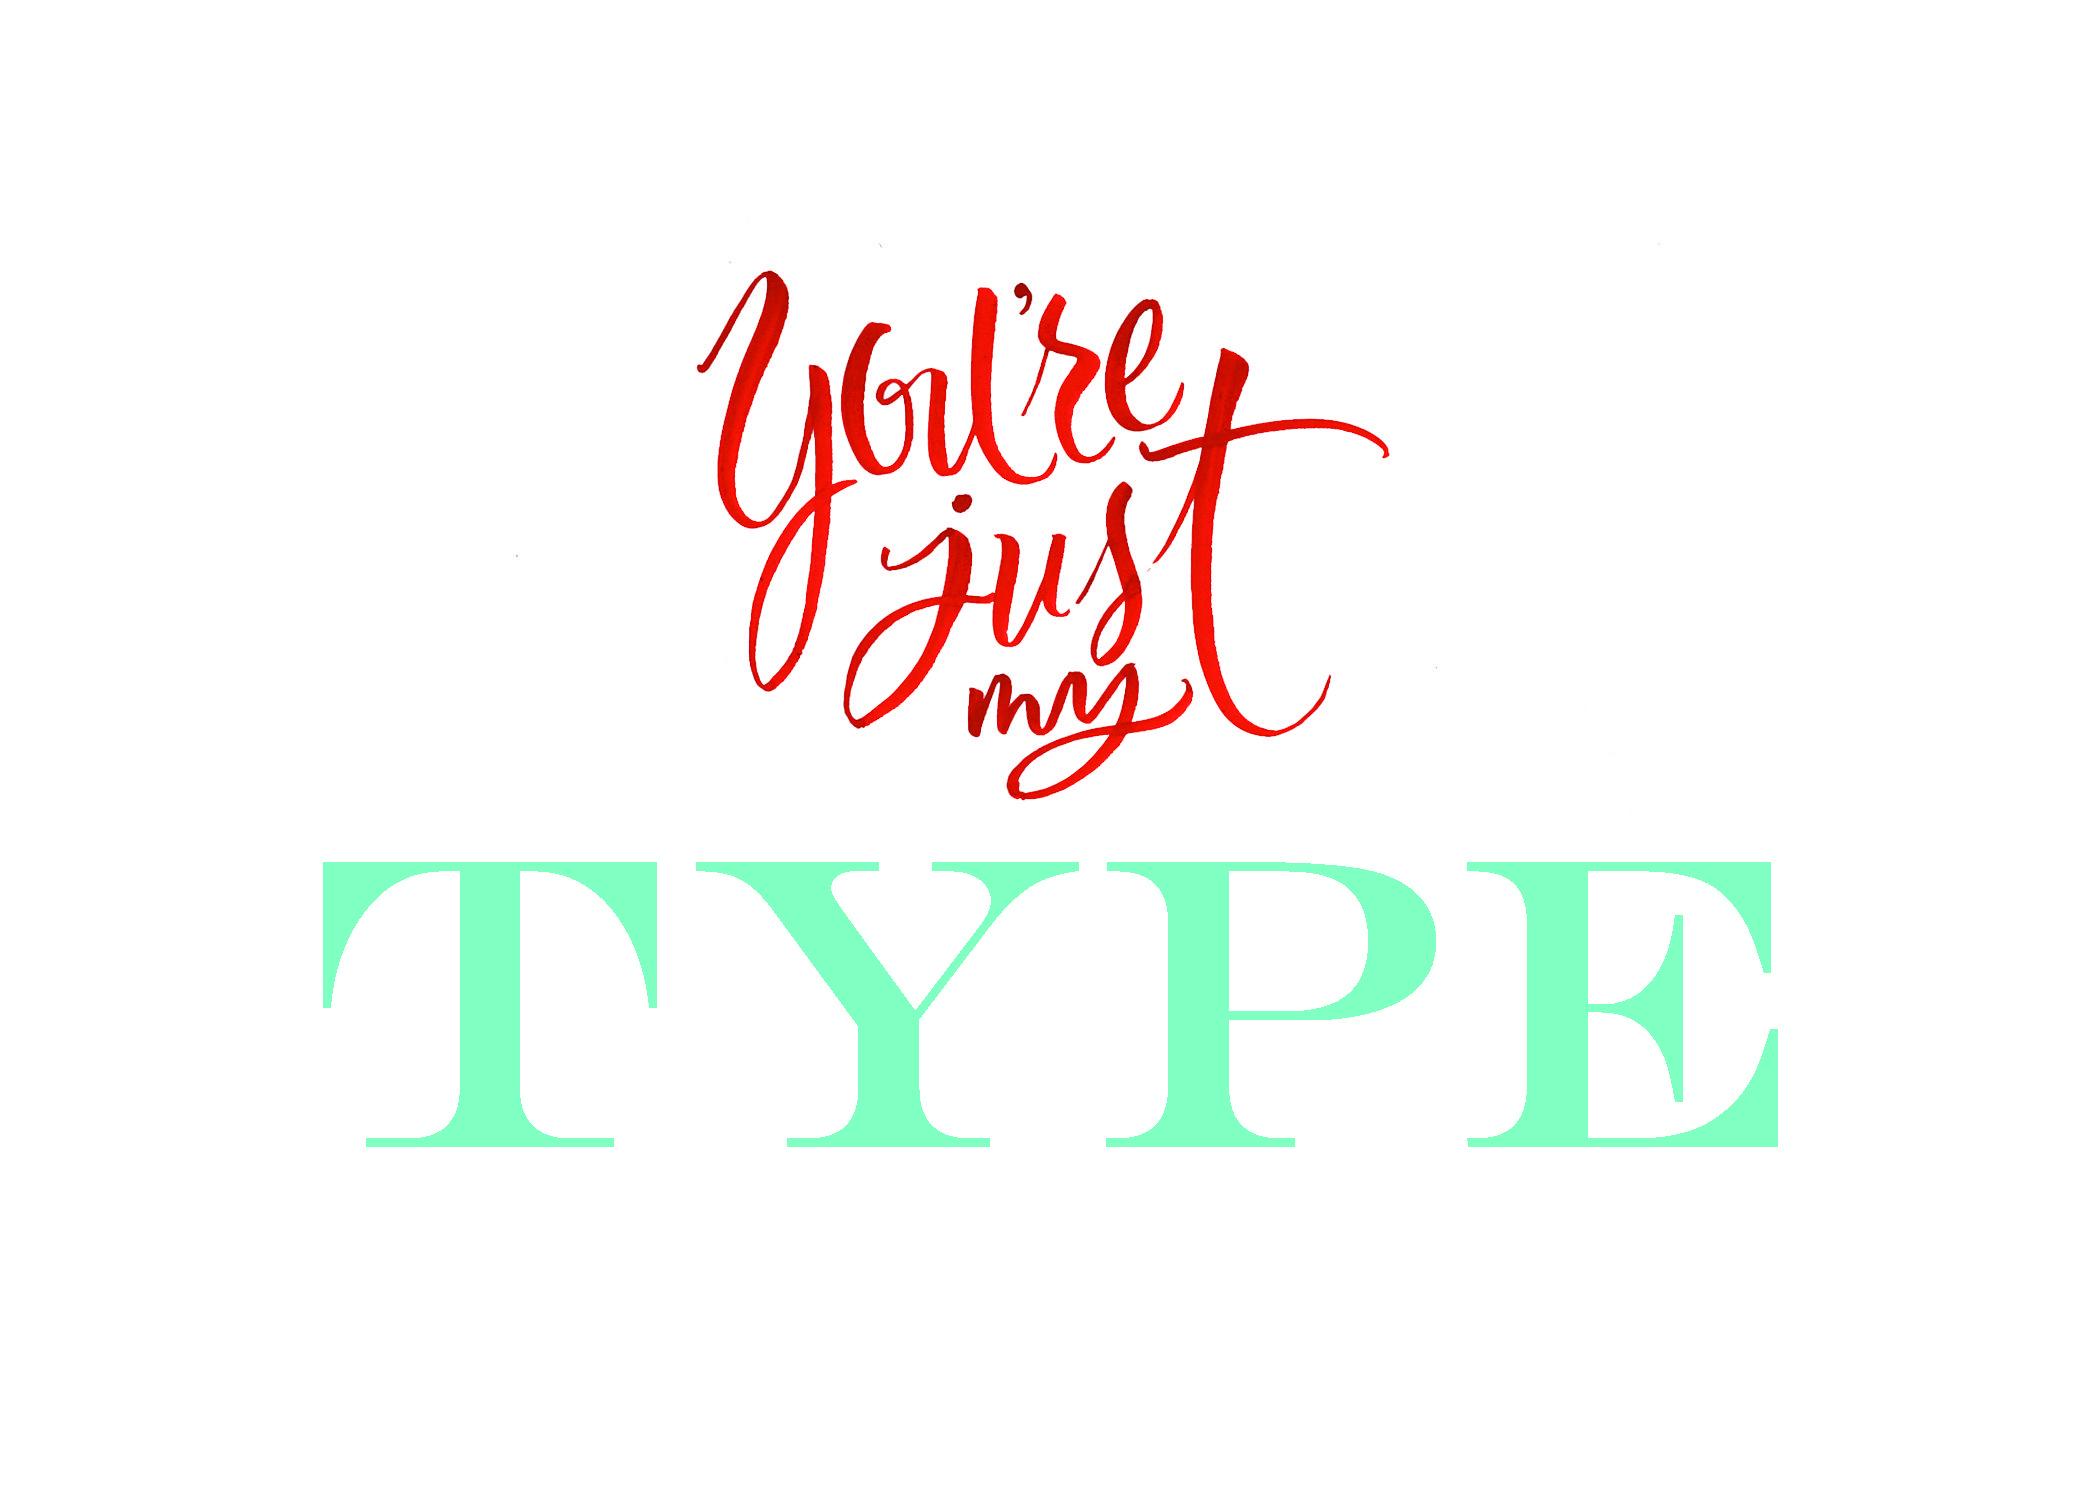 Fancy Cursive Letters Tattoos Clipart